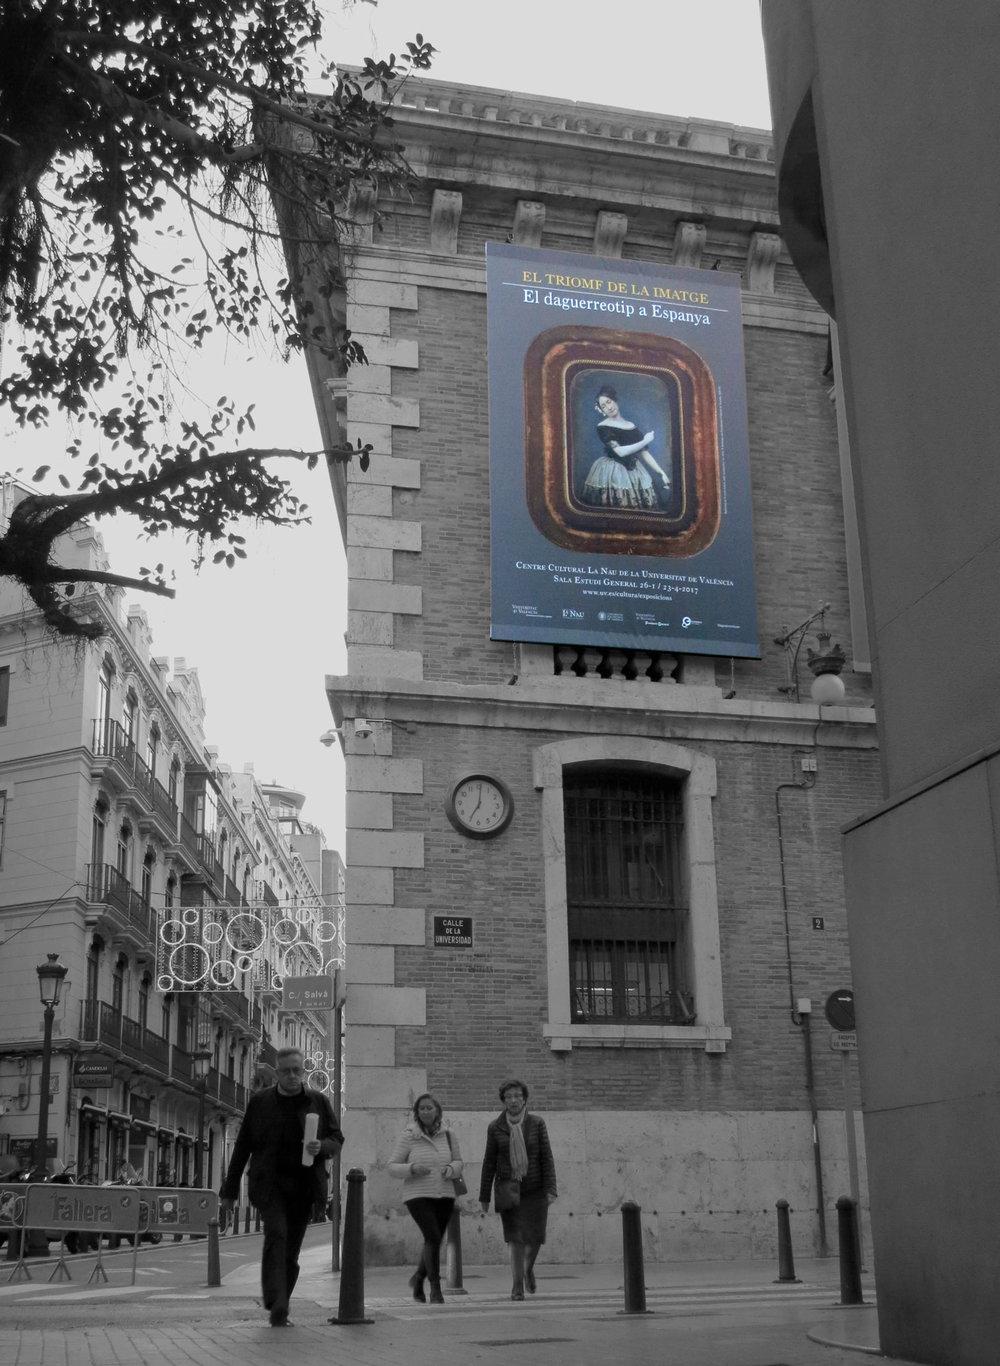 2-El-Triomf-de-la-imatge-exposicion-daguerrotipos-La-Nau-serraysaez-manuel-serra-saez-designer-graphic.jpg